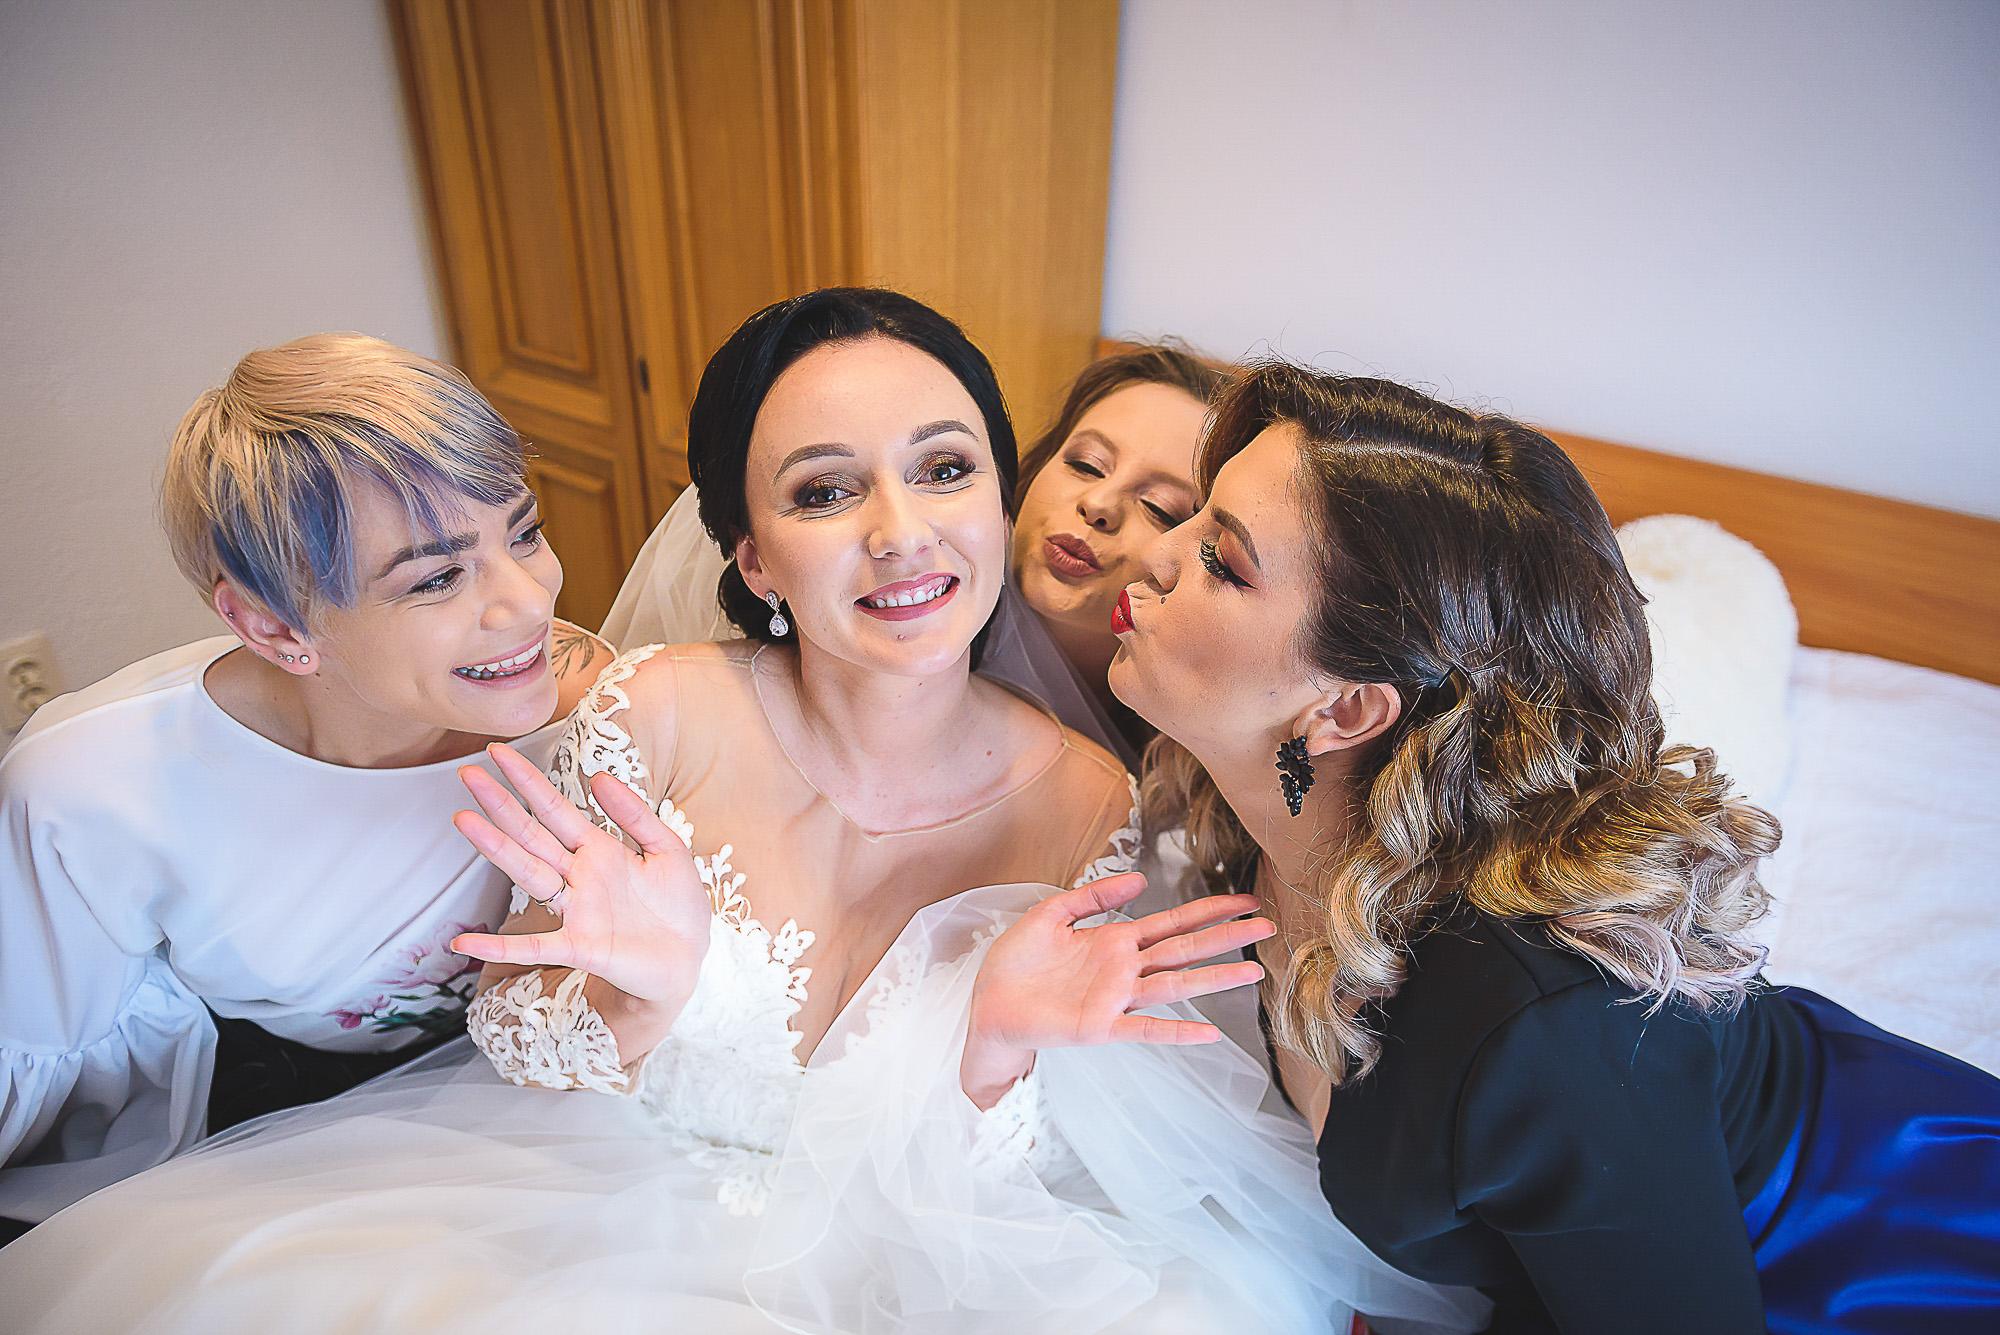 fotografie creativa de nunta, fotograf nunta mures, foto nunta reghin, foto video reghin, pregatirile miresei, foto video nunta mures, prietenele miresei, fetele, best friends forever, BFF, Pinterest ideea,